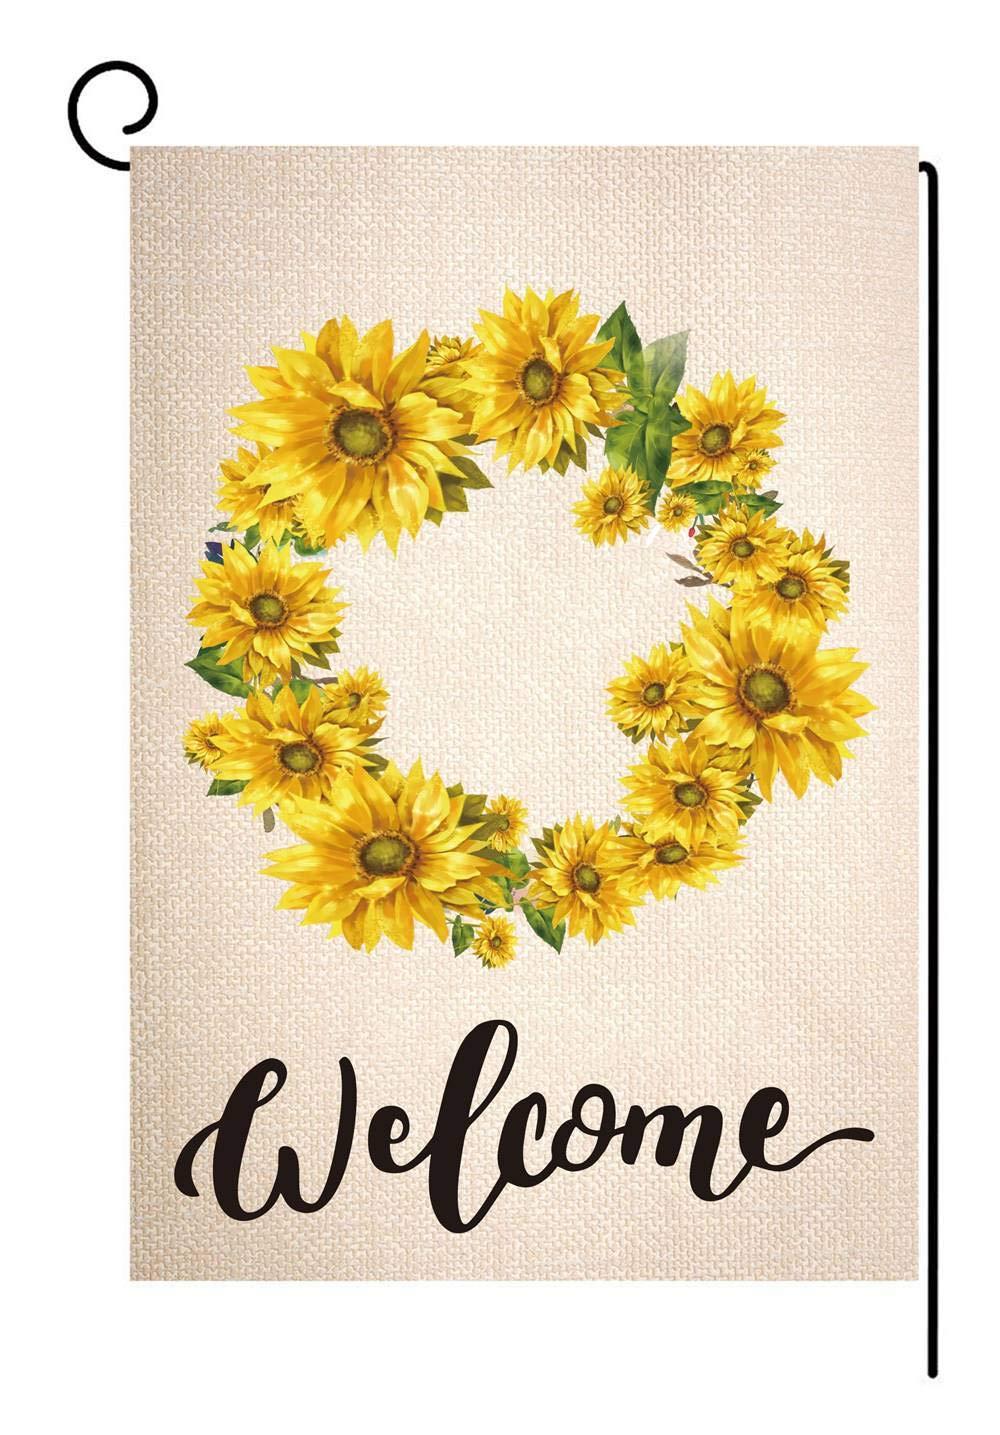 STYLEZONE Sunflower Wreath Small Garden Flag Vertical Double Sided Summer Fall Farmhouse Burlap Yard Outer Decor 12.5 x 18 Inch